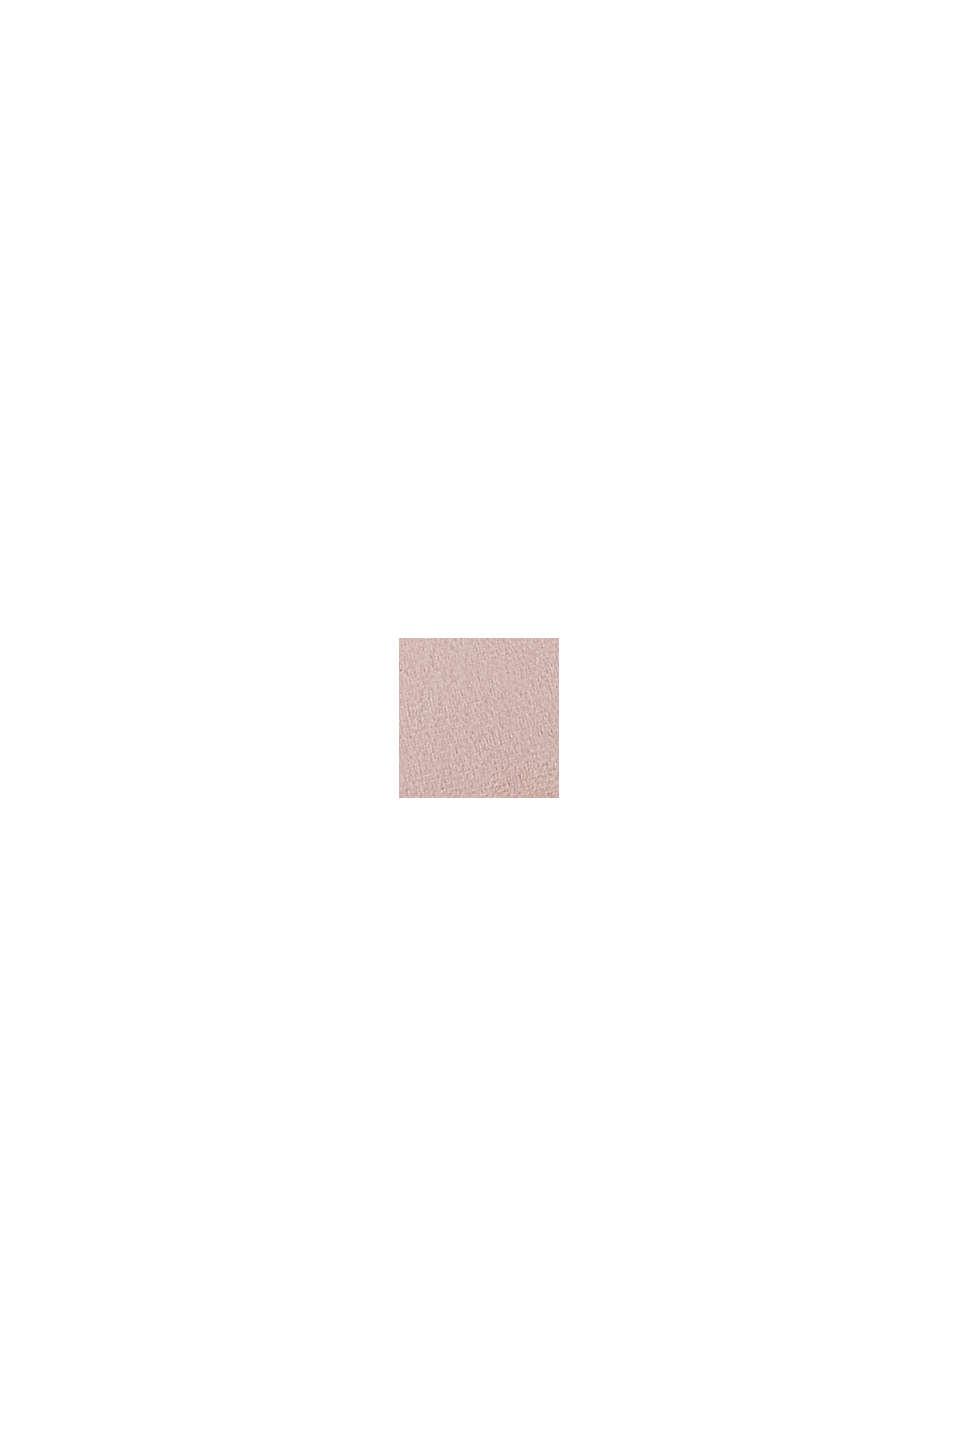 Cadre photo en micro velours, ROSE, swatch